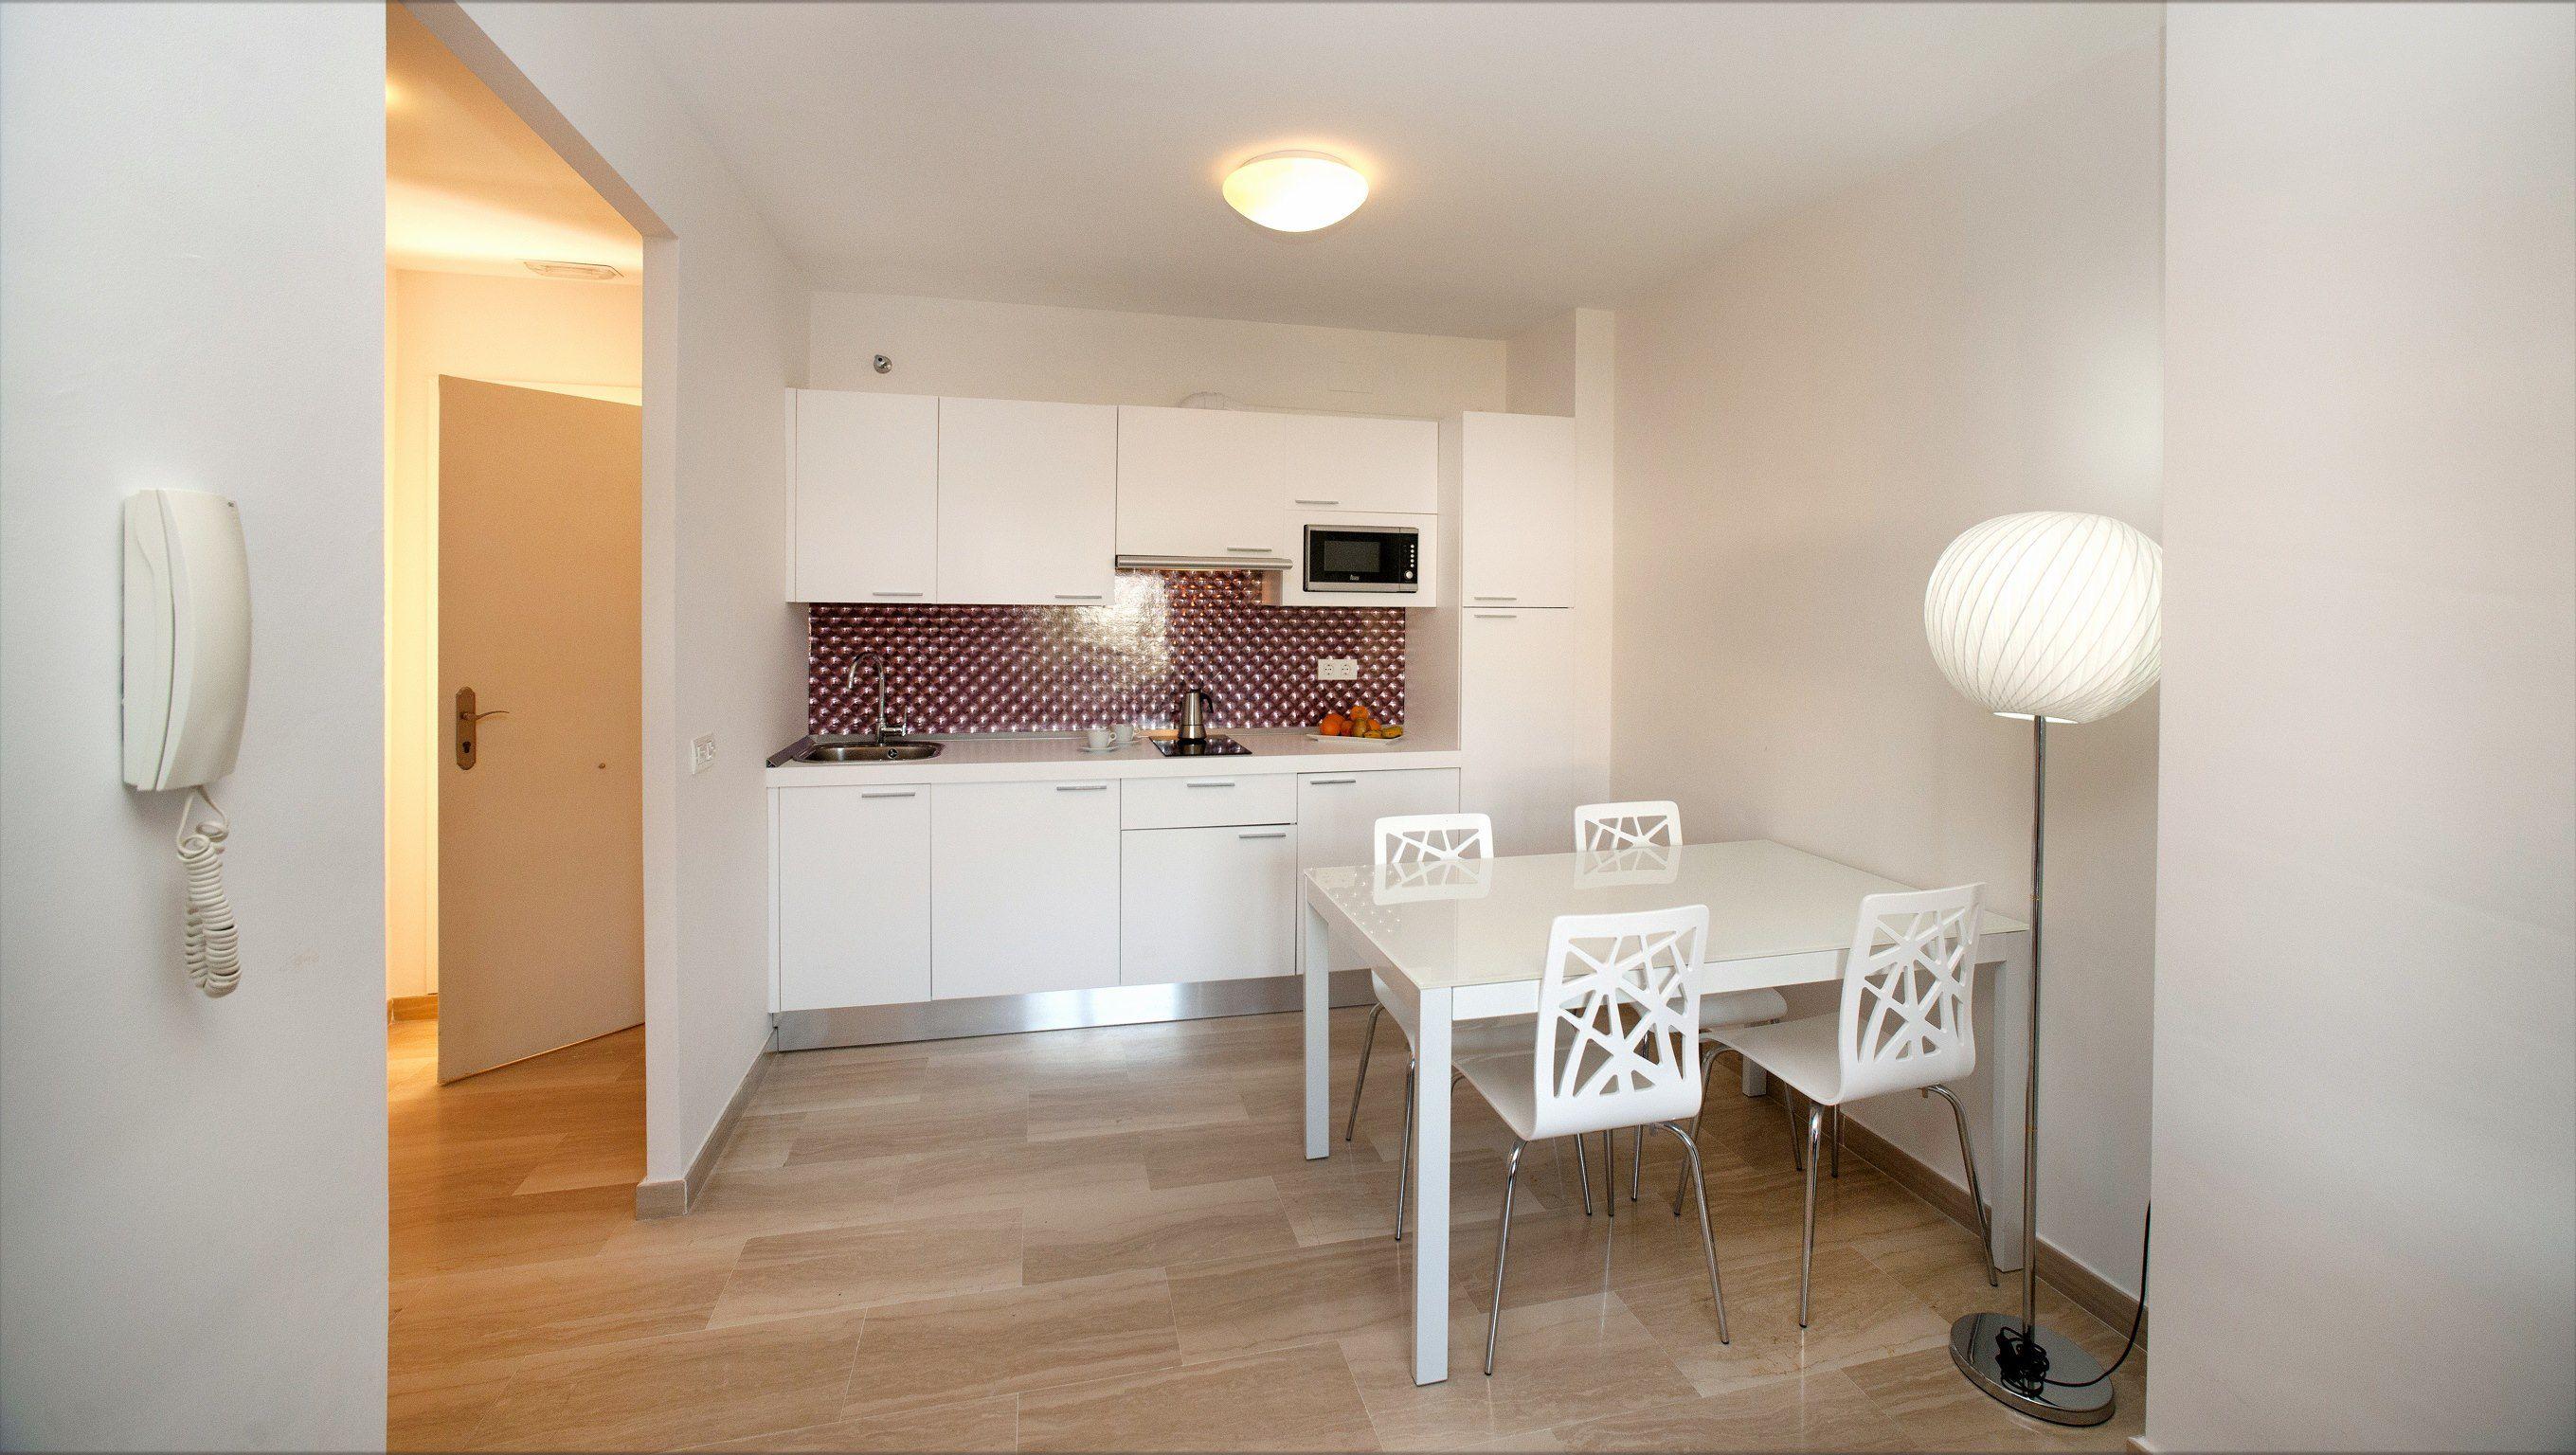 Apartamento 1 dormitorio Superior del hotel Leo Canela. Foto 1